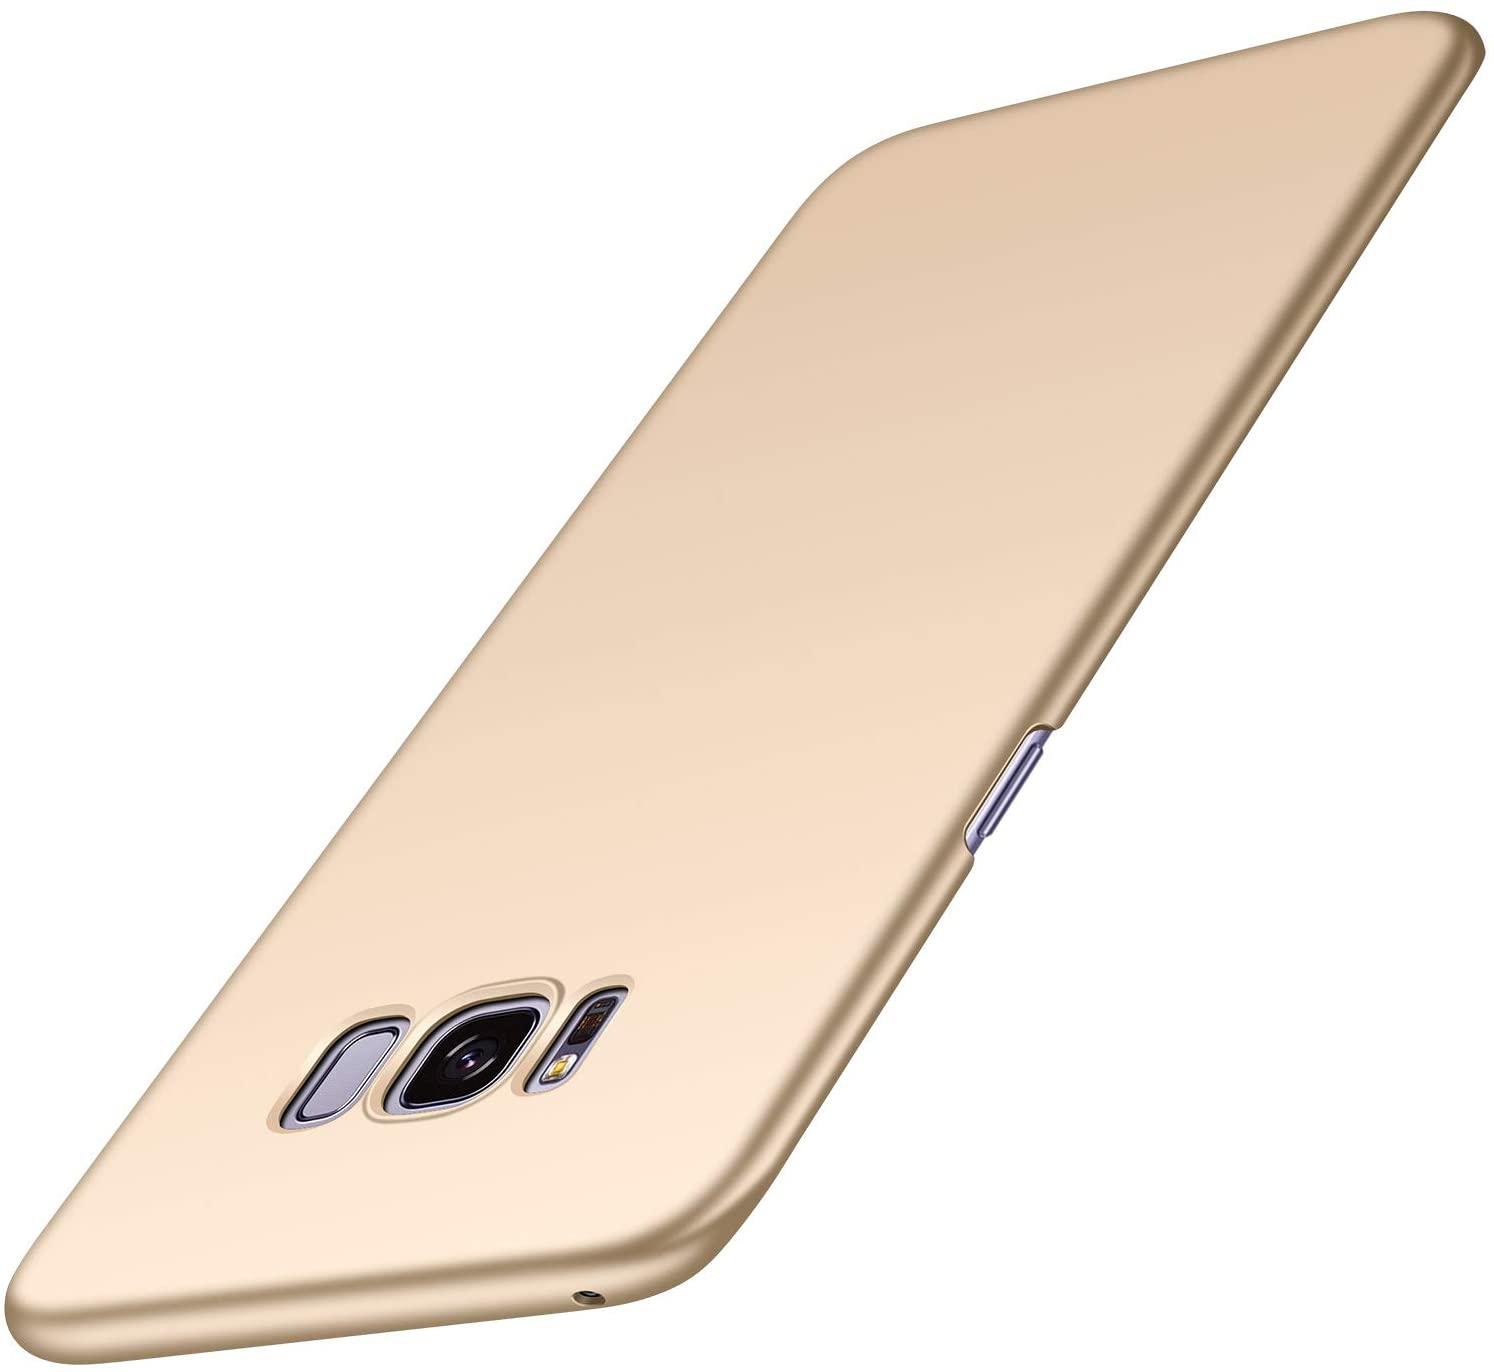 Almiao Samsung Galaxy S8+ Plus Case, [Ultra-Thin] Minimalist Slim Protective Phone Case Back Cover for Samsung Galaxy S8 Plus (Smooth Gold)